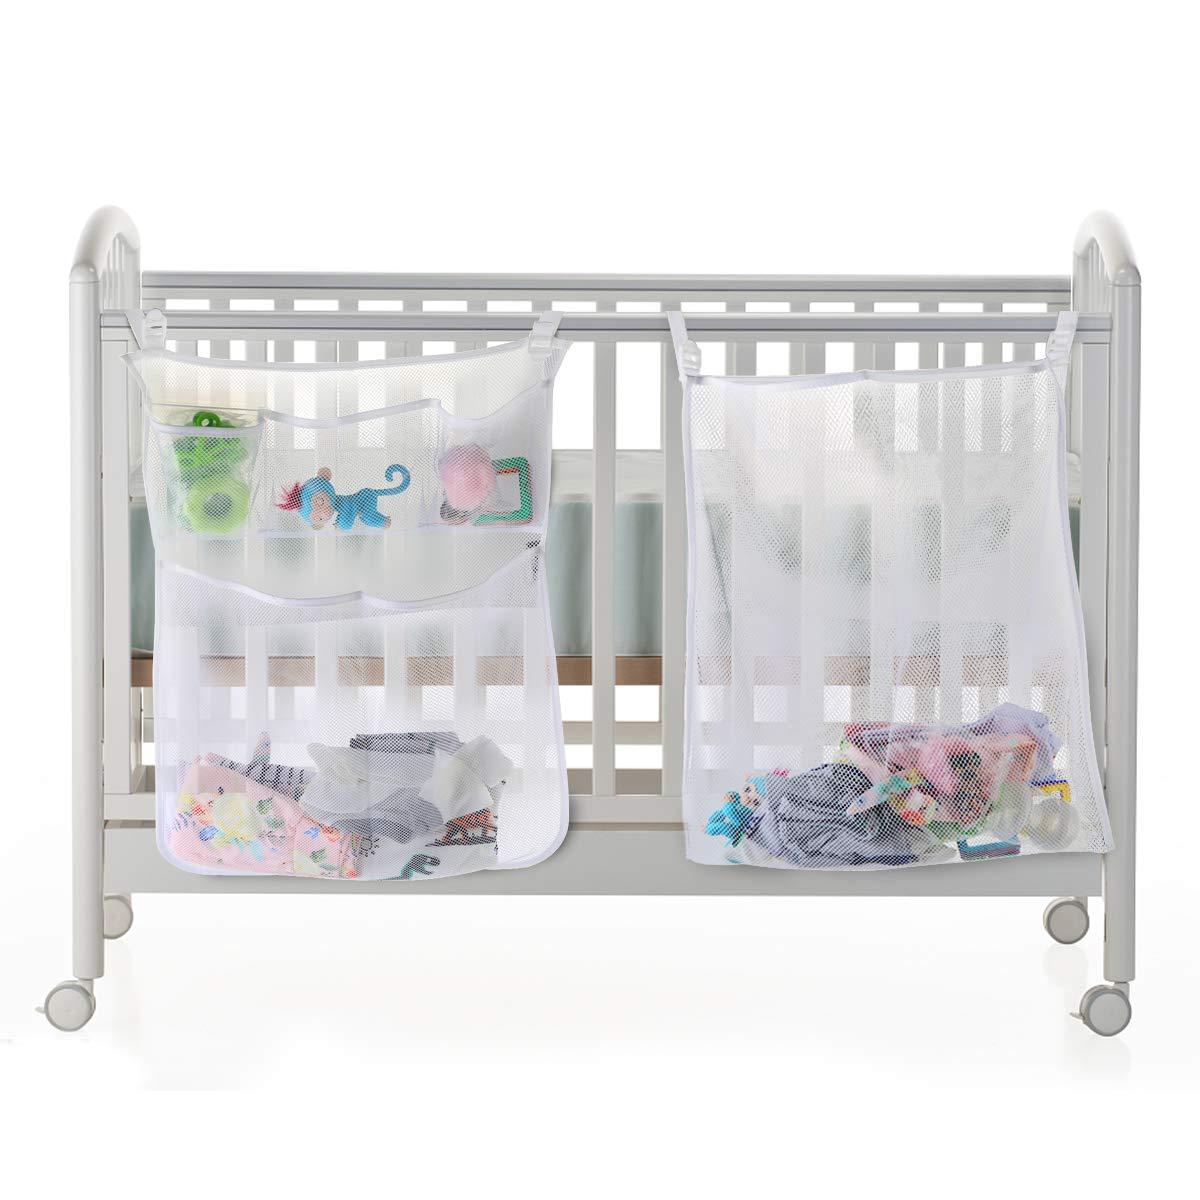 Baby Crib Clothes Diaper Organizer Mesh Bag Nursery Bedside Hanging Storage Bag